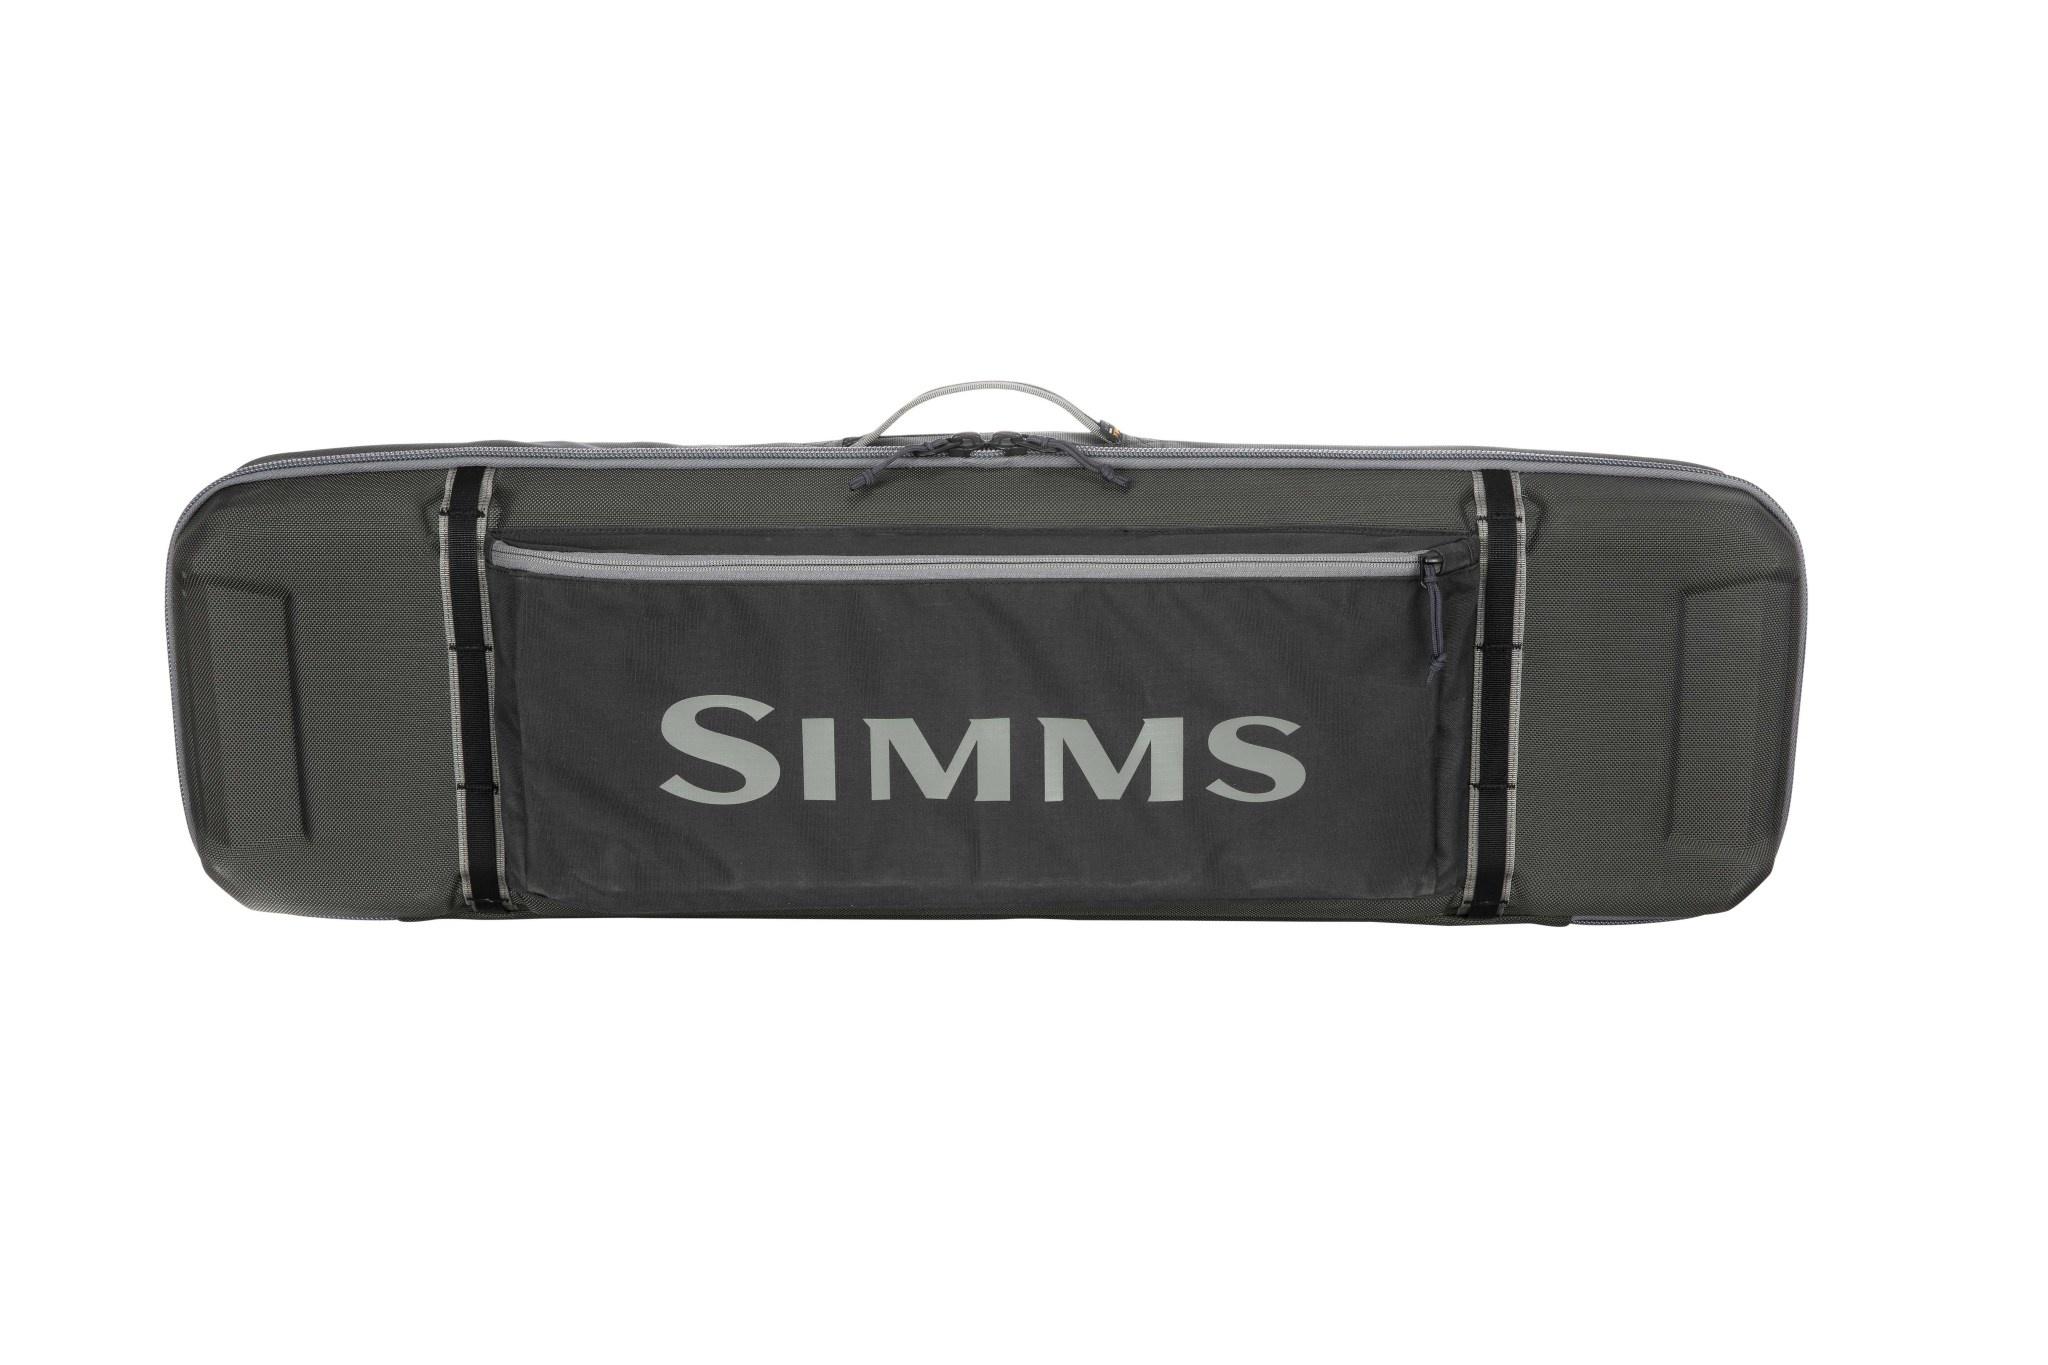 Simms Simms GTS Rod & Reel Vault